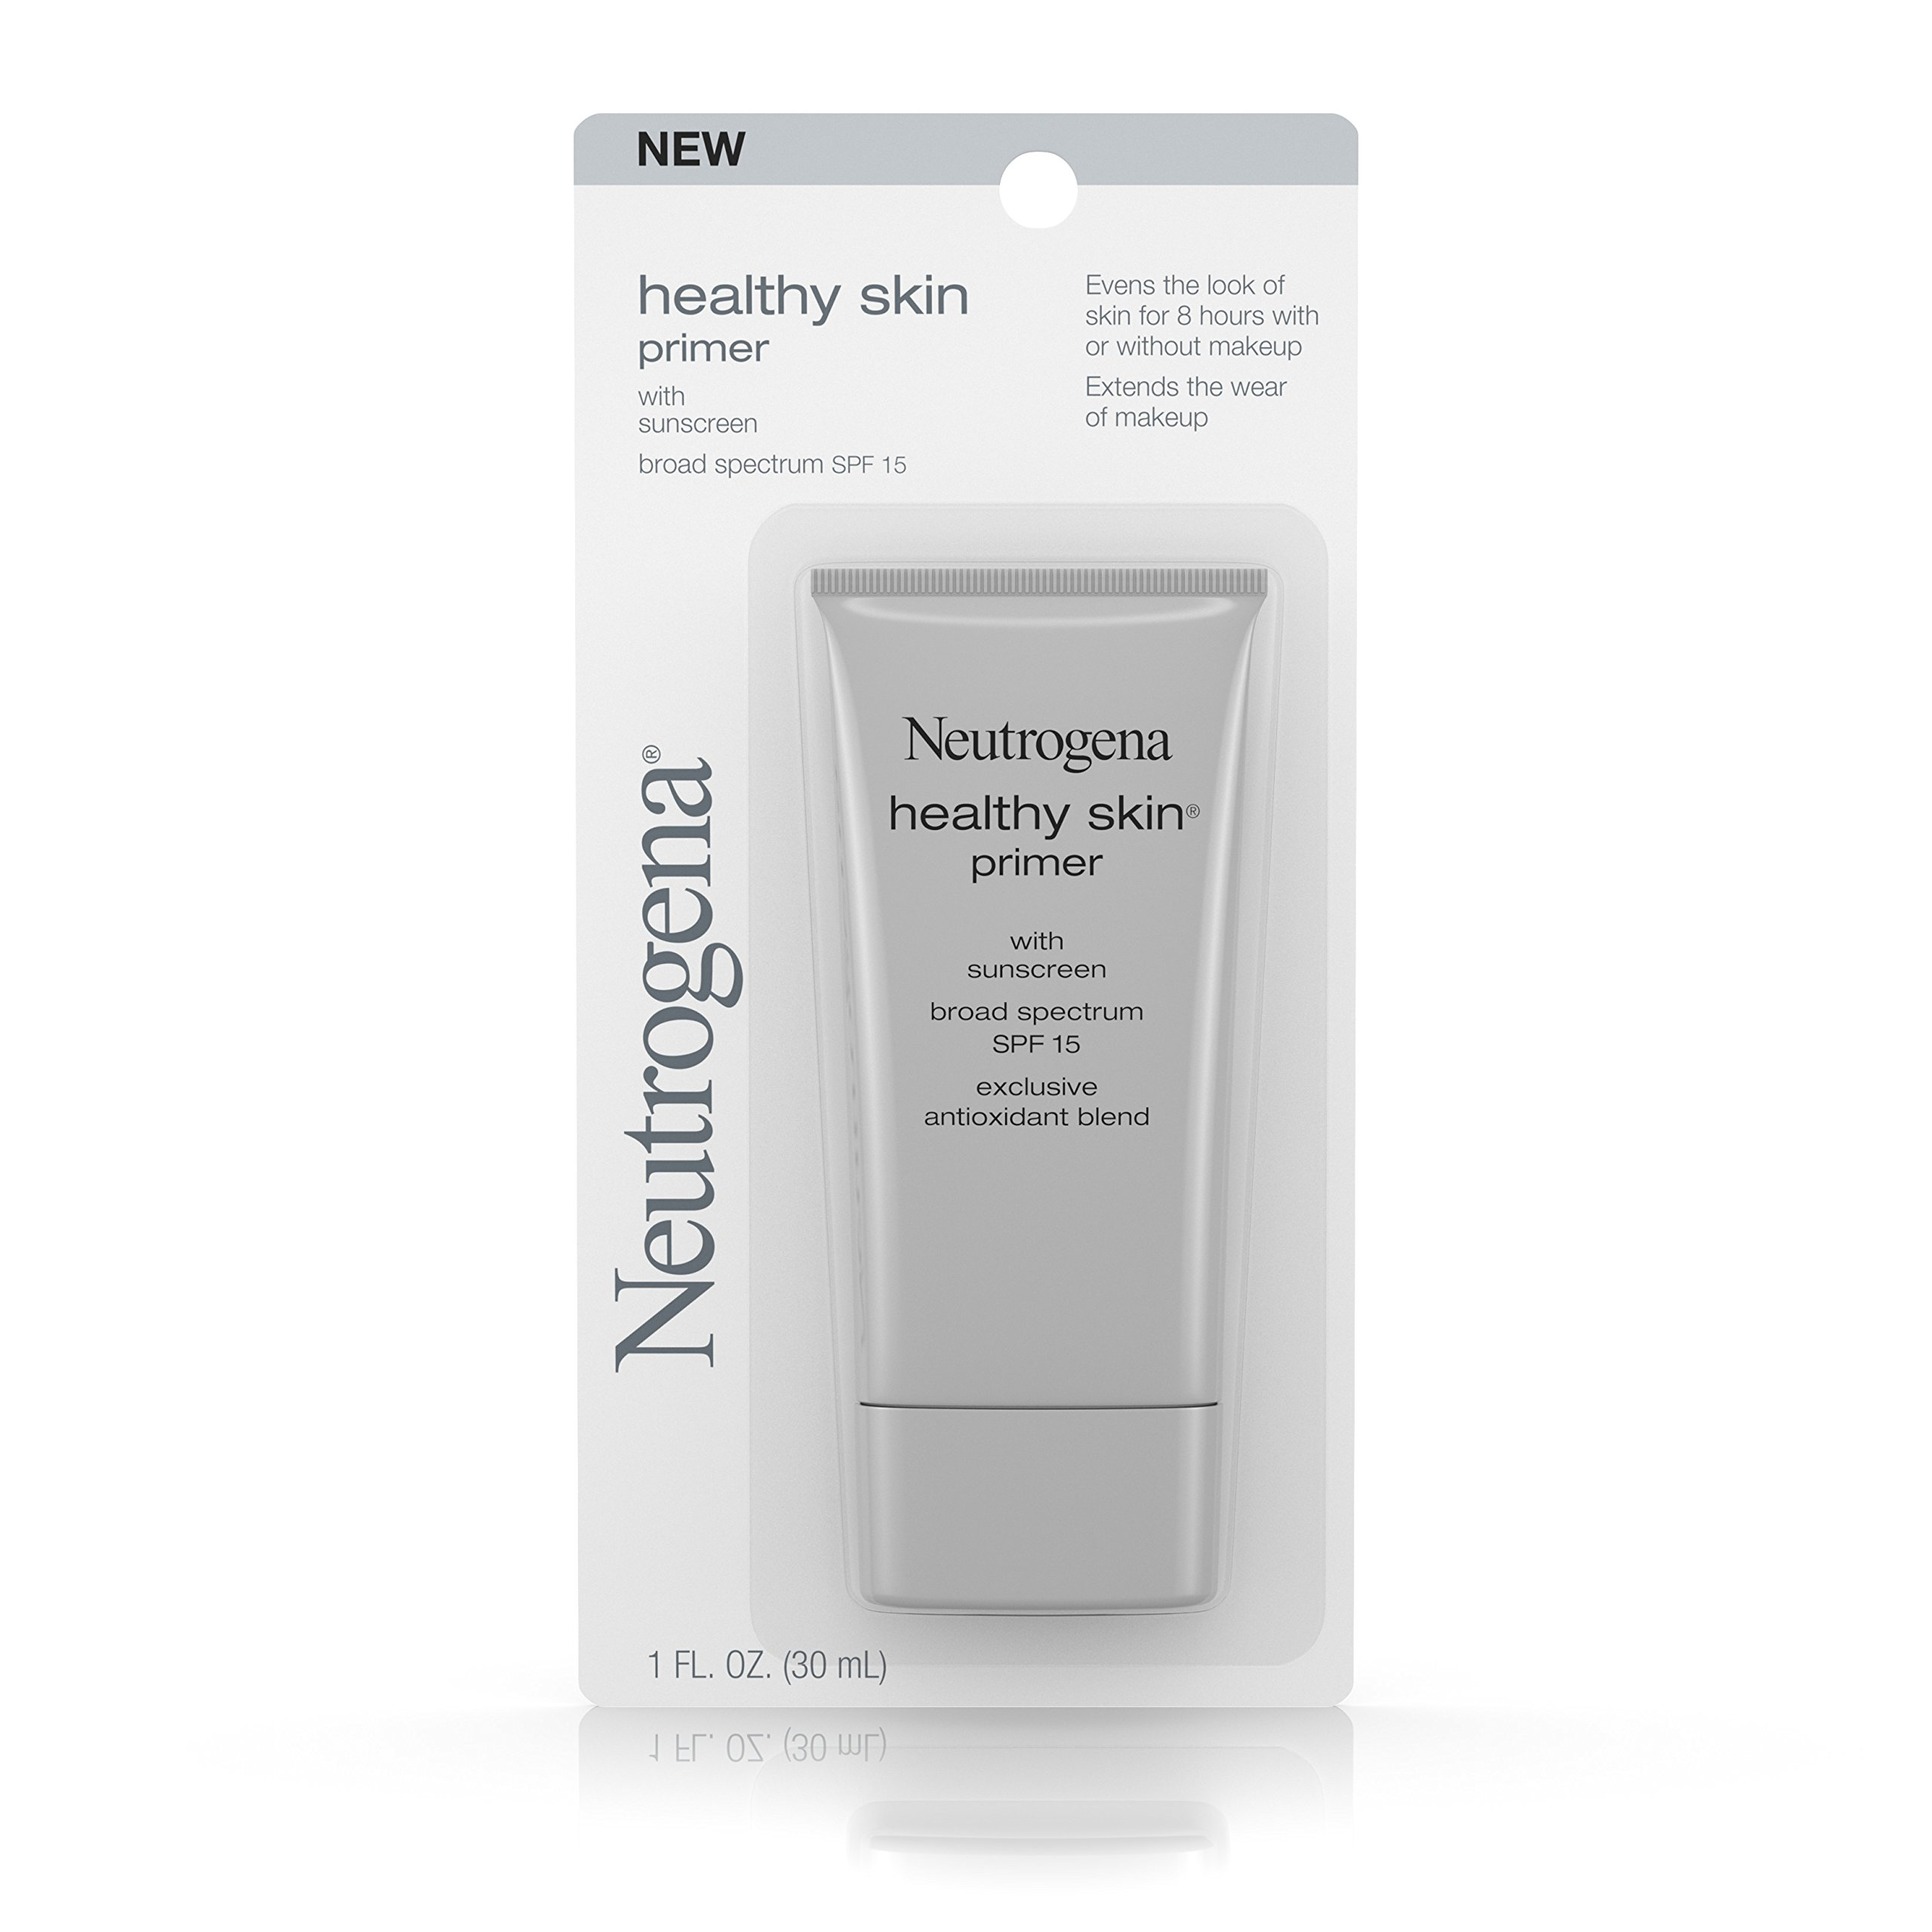 Neutrogena Healthy Skin Primer Broad Spectrum SPF 15, 1 Fl. Oz